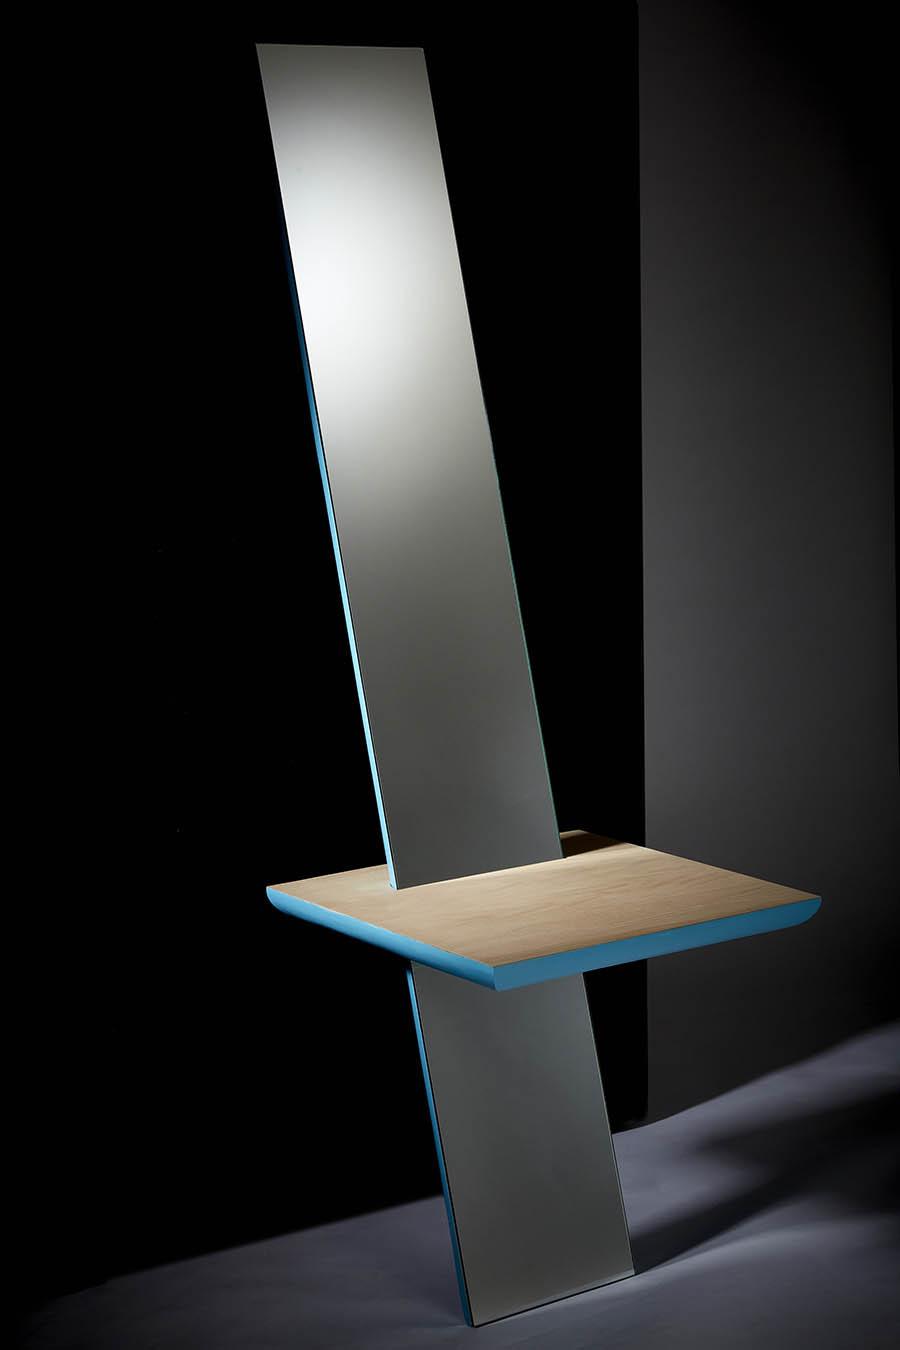 studio 19 mirror product photography gallery